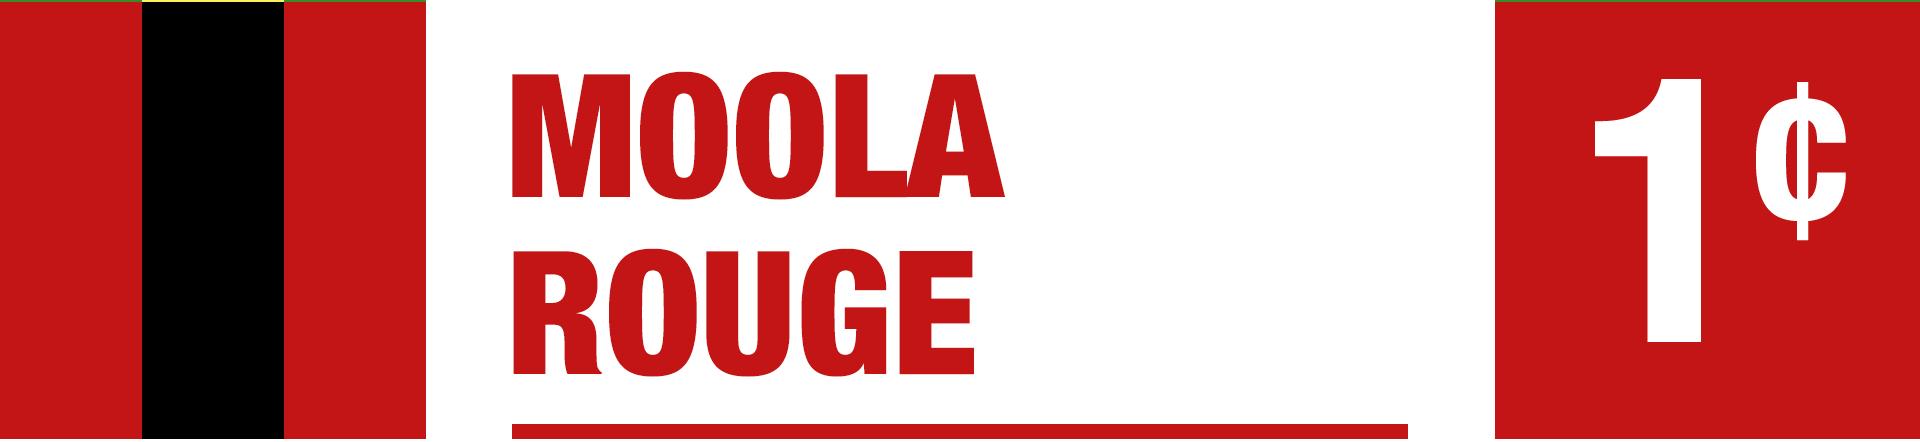 Moola Rouge